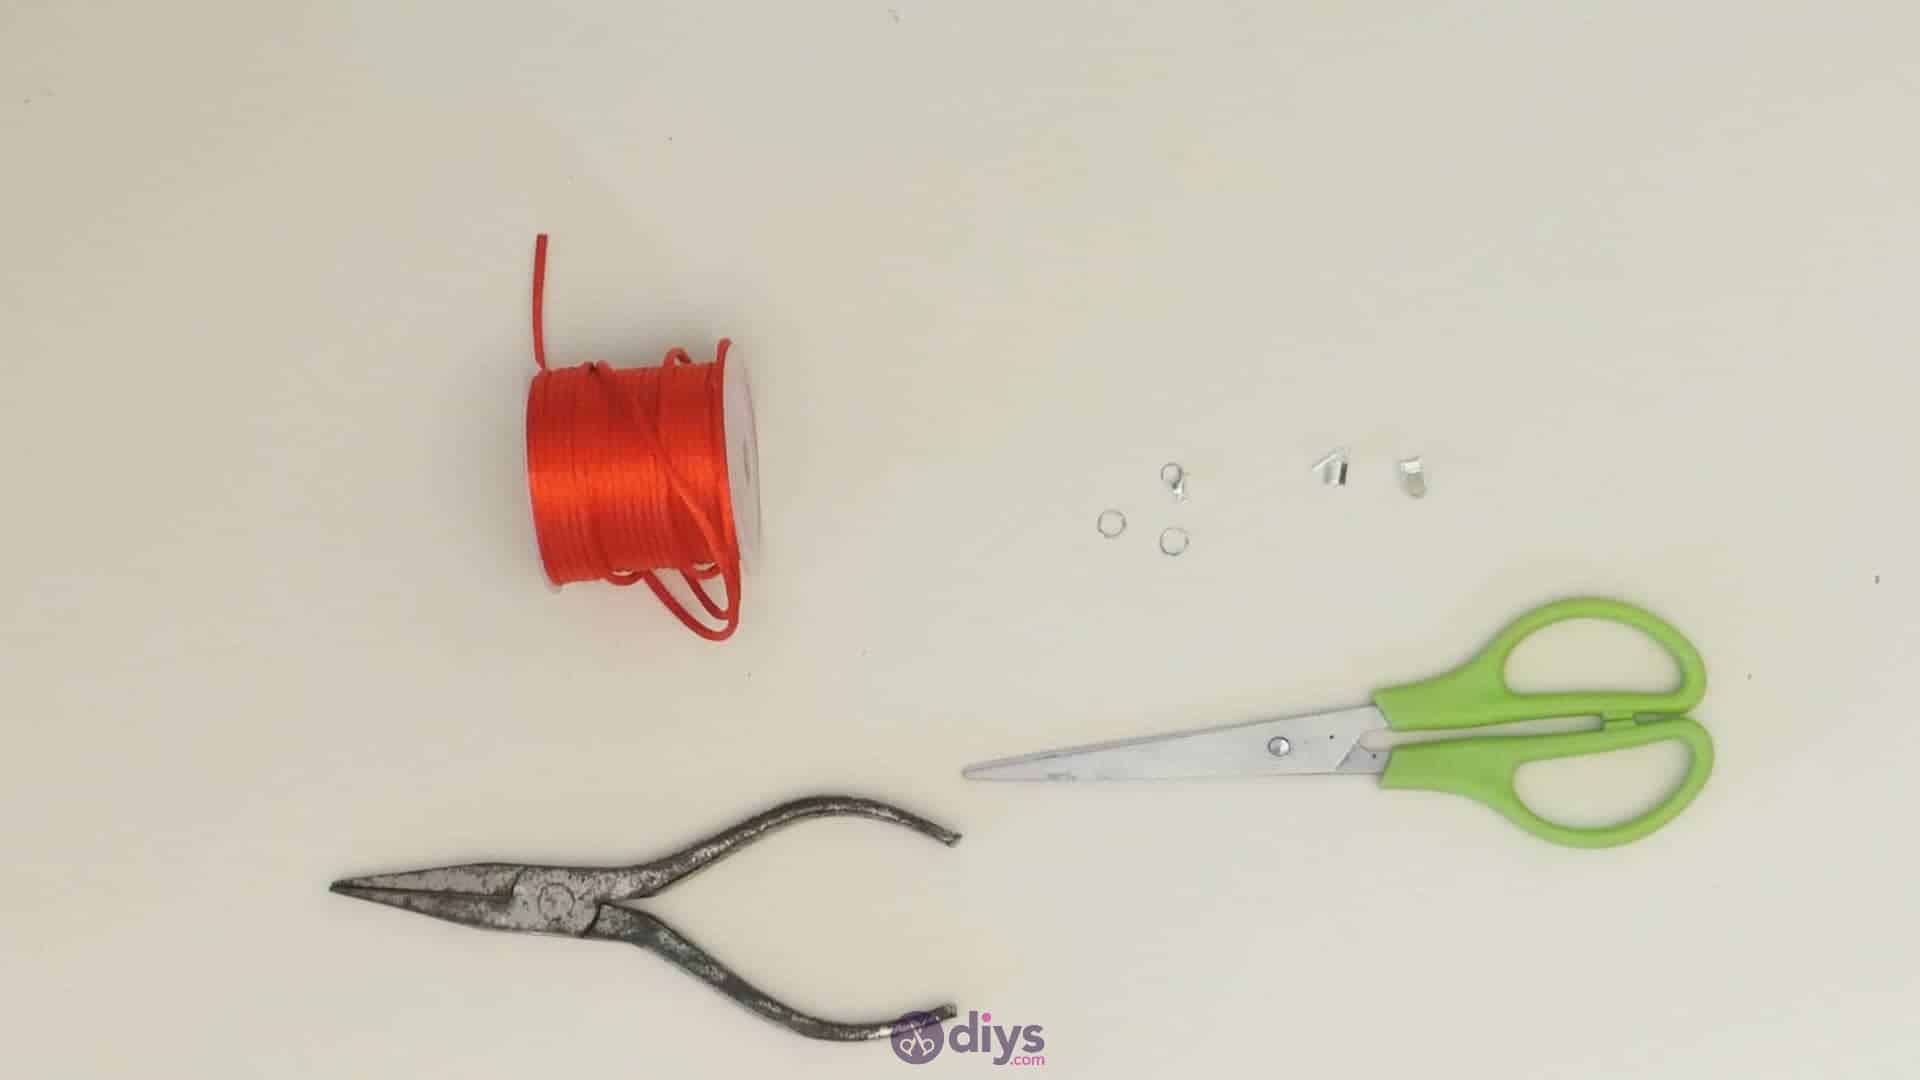 Diy knotted bracelet materials